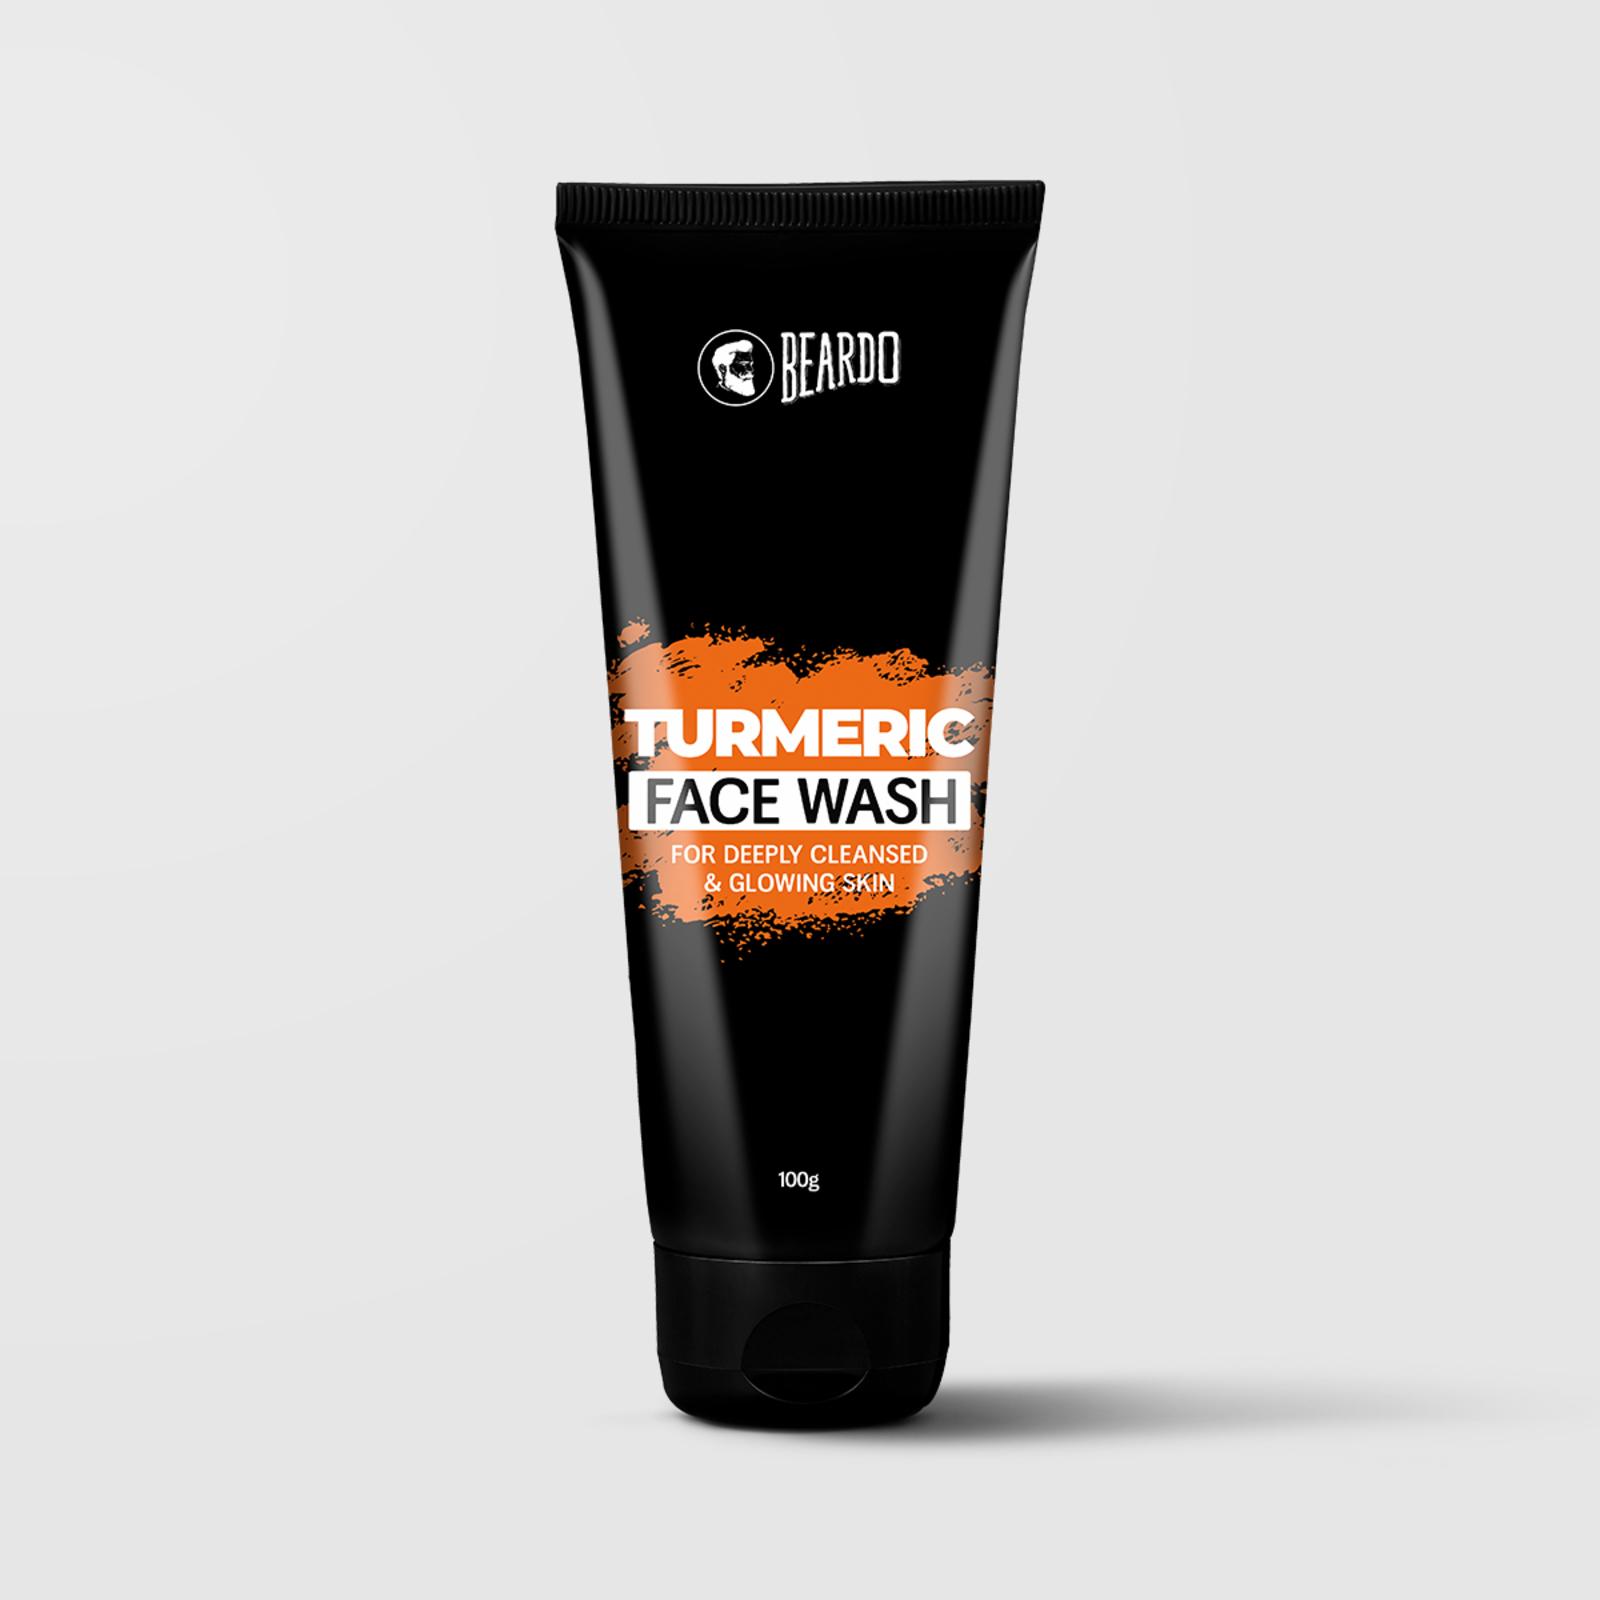 Beardo Turmeric Facewash for Men (2 Units)